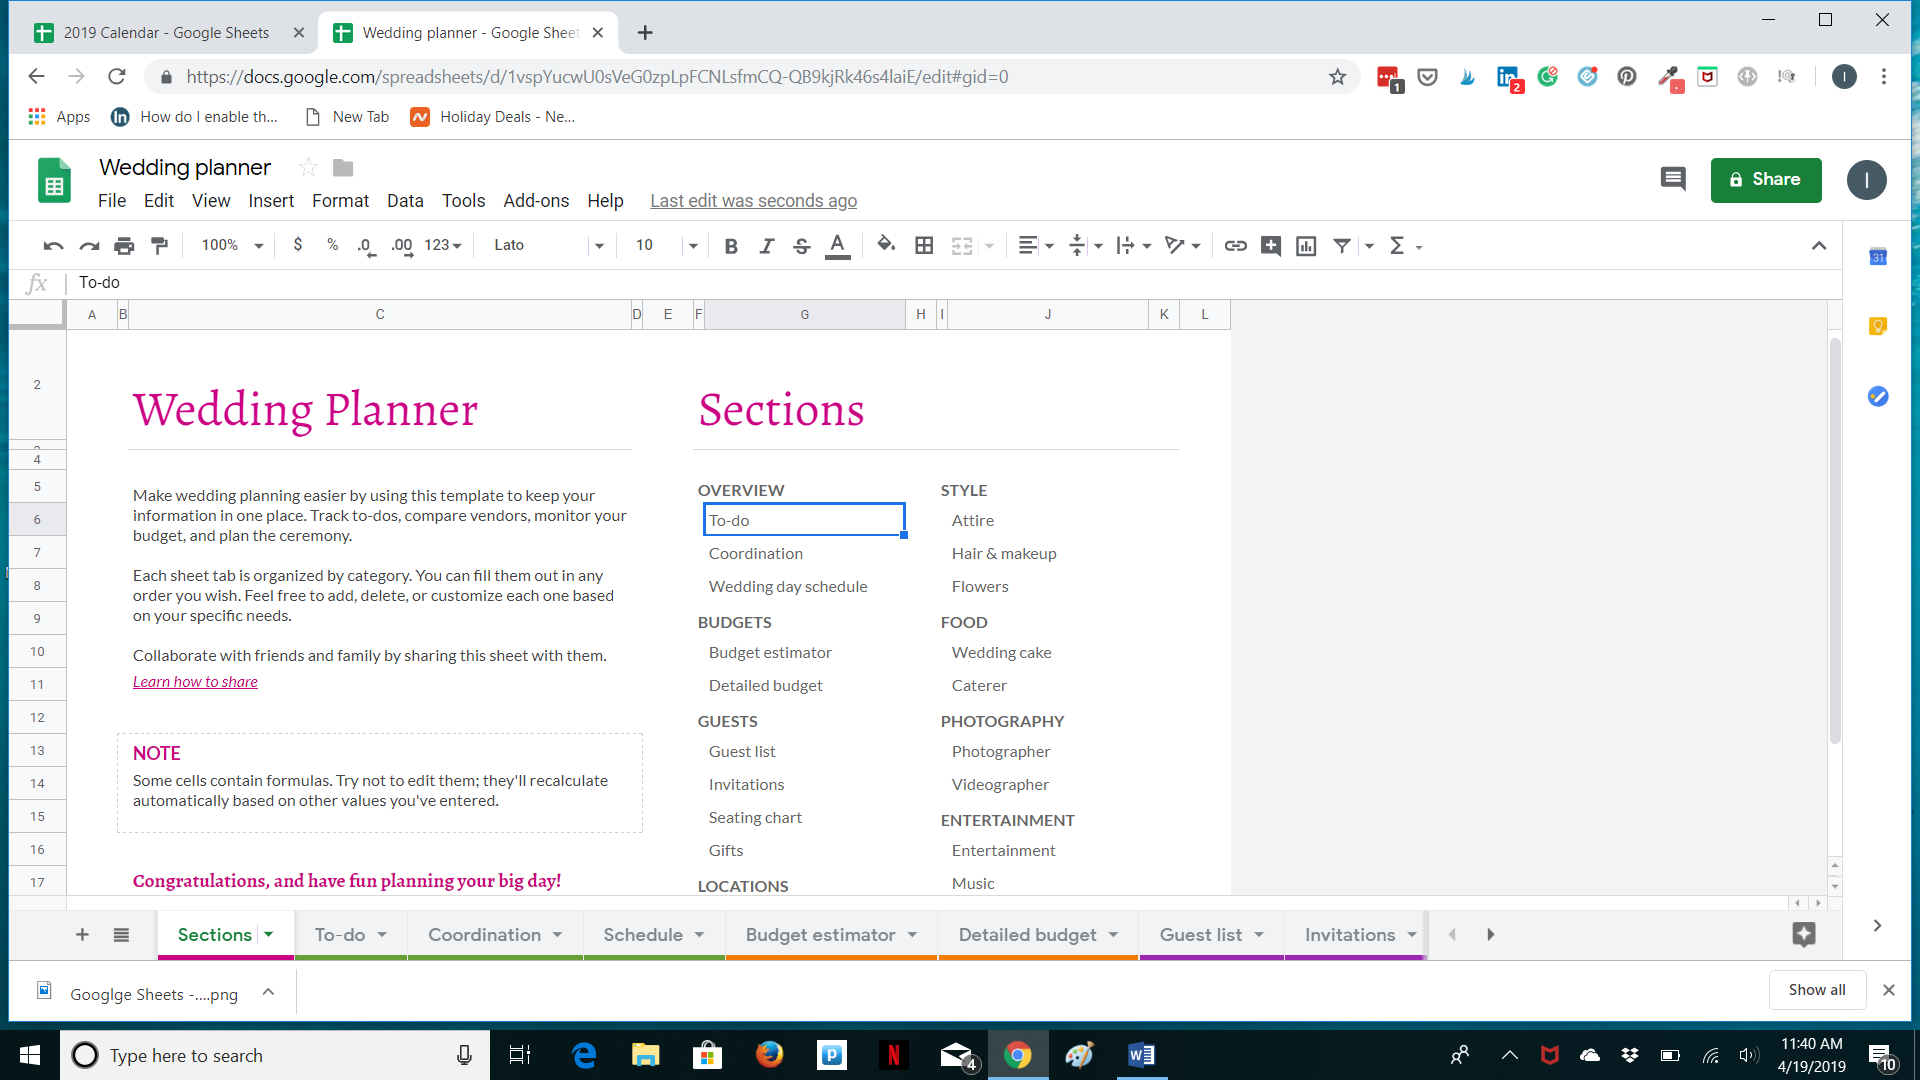 Google Sheets - Planning